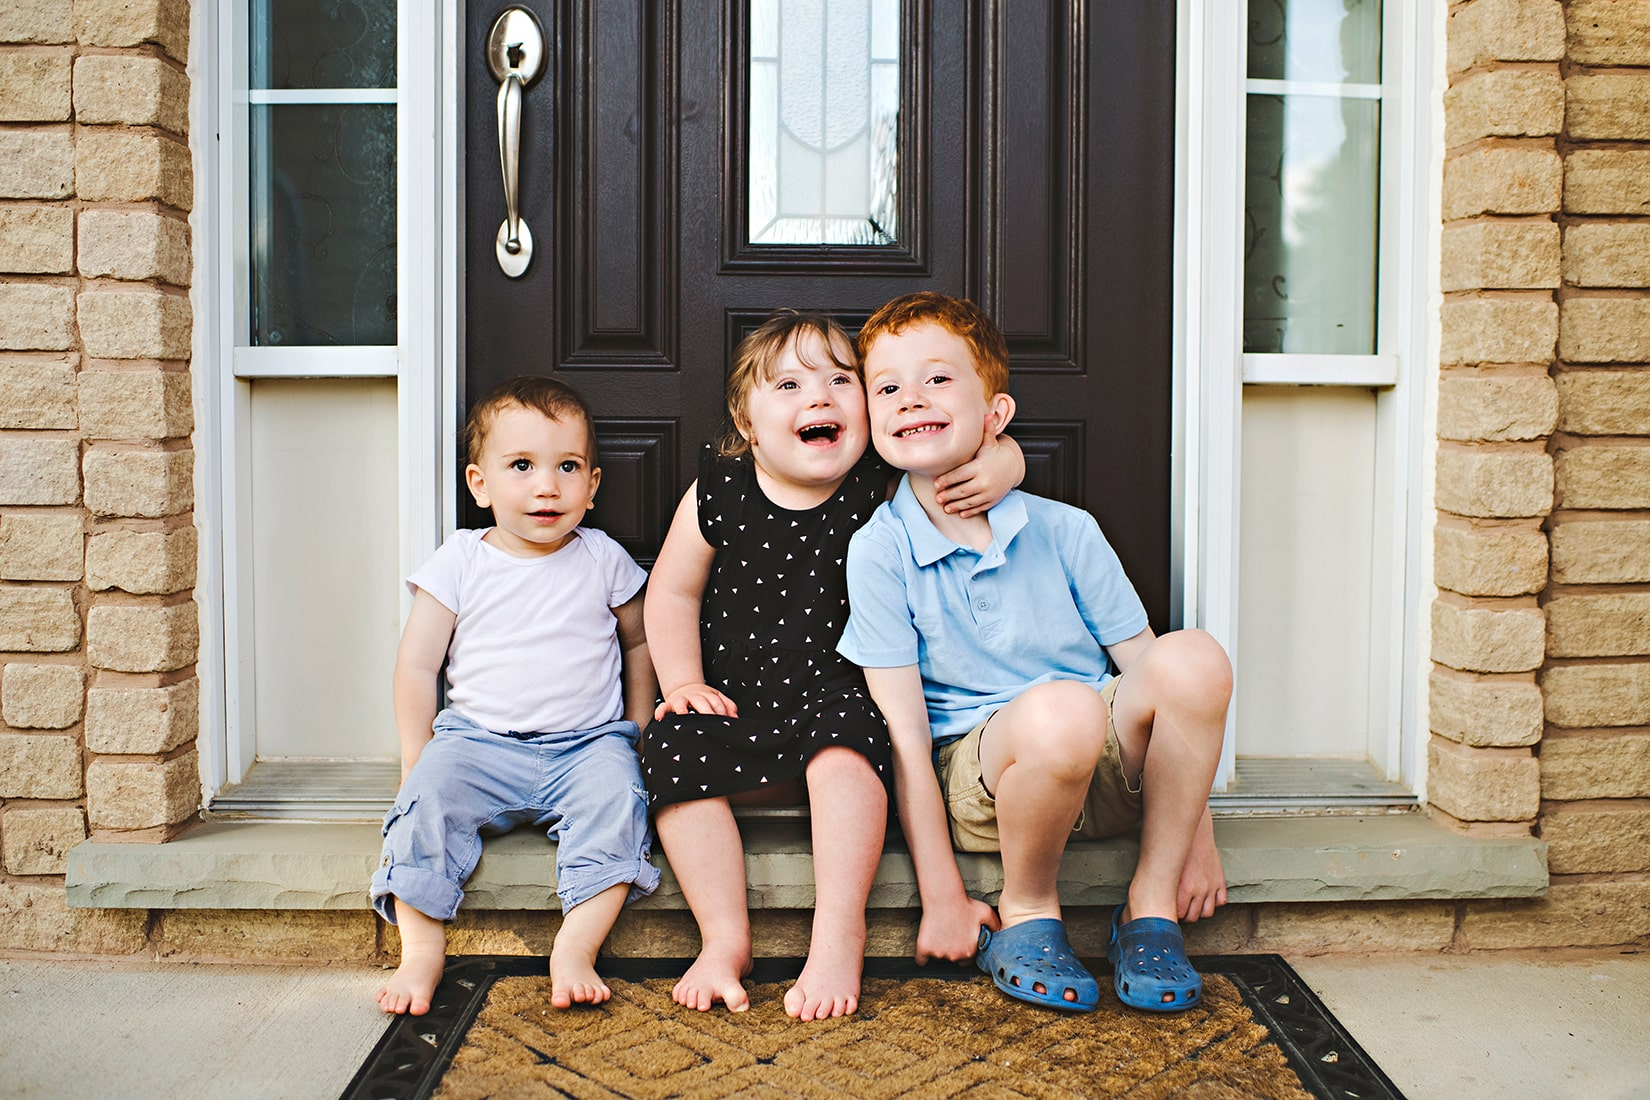 Young kids on doorstep